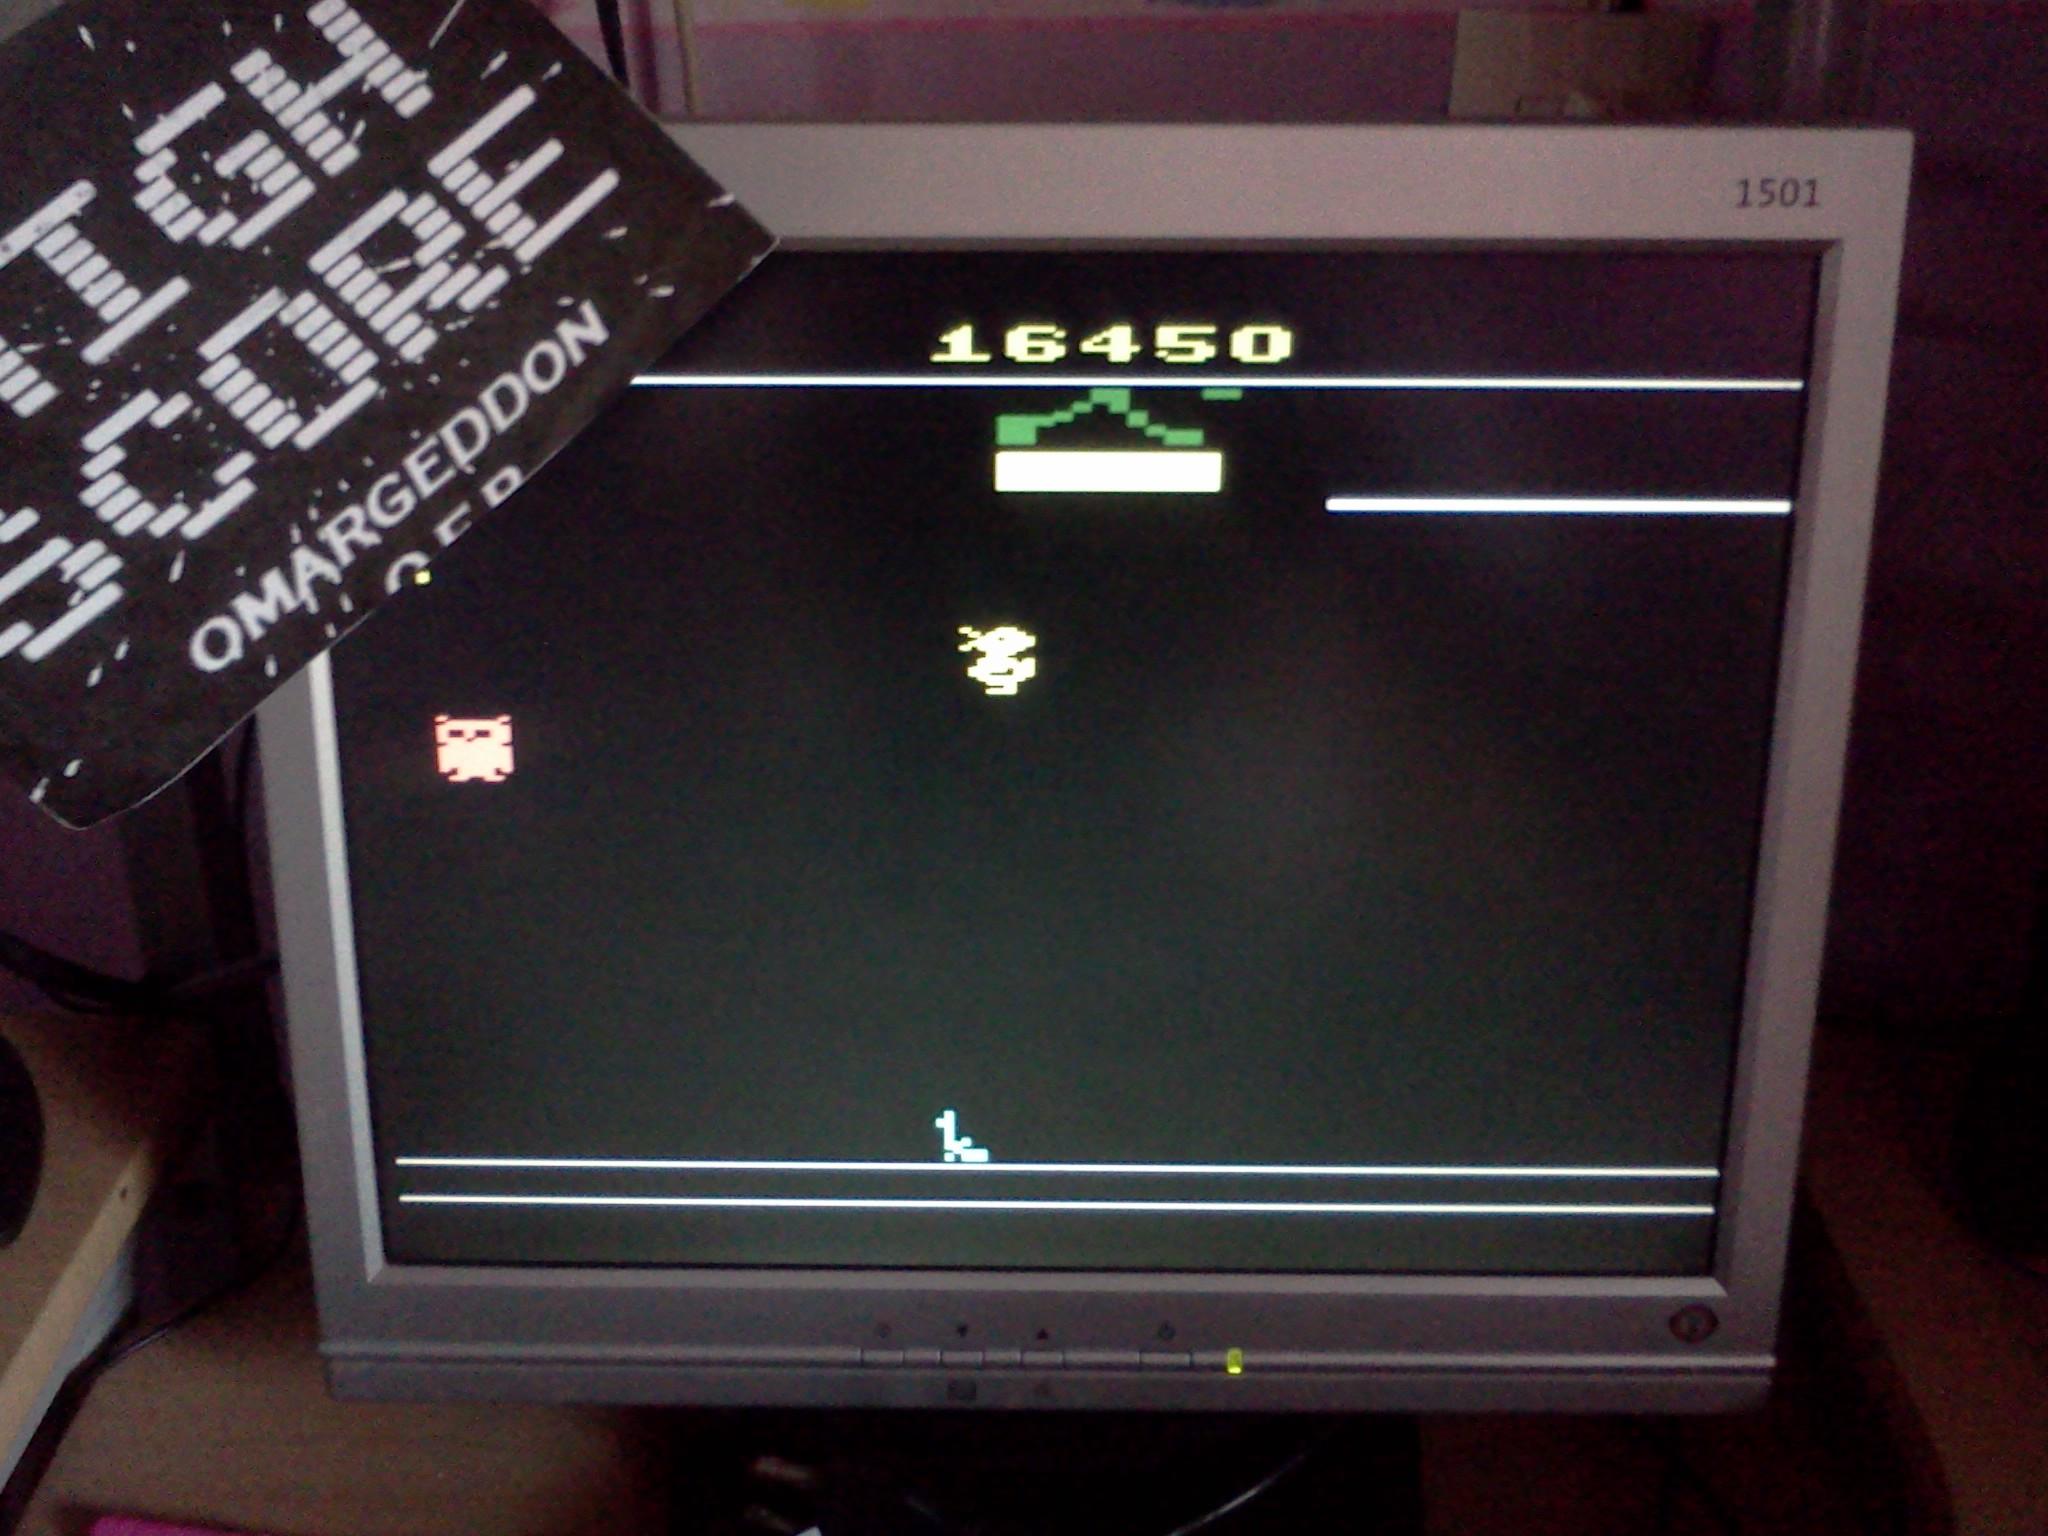 omargeddon: Carnival (Atari 2600 Emulated Novice/B Mode) 16,450 points on 2016-08-31 17:19:55